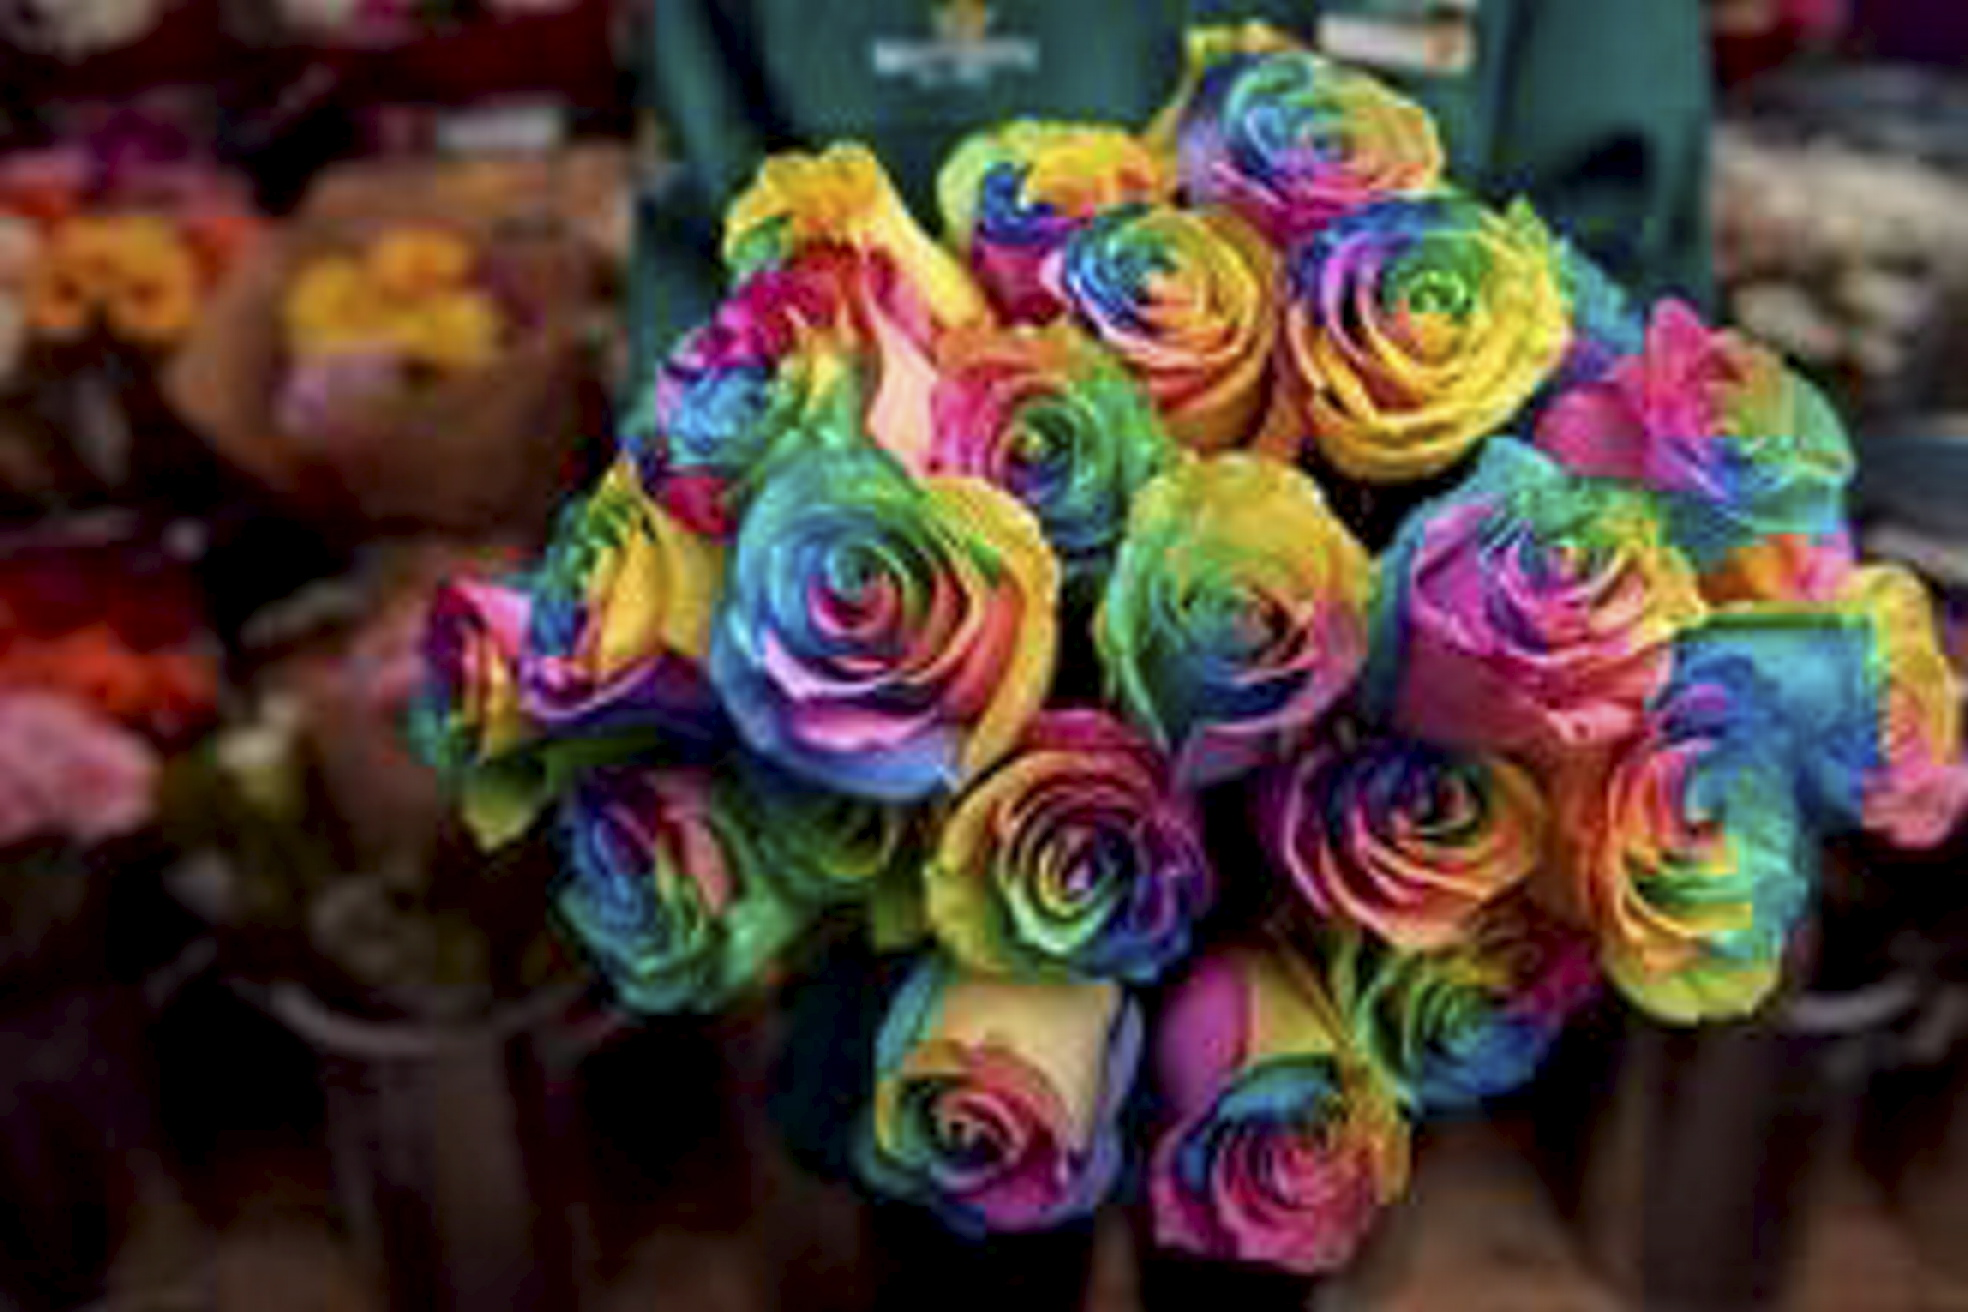 The rainbow roses